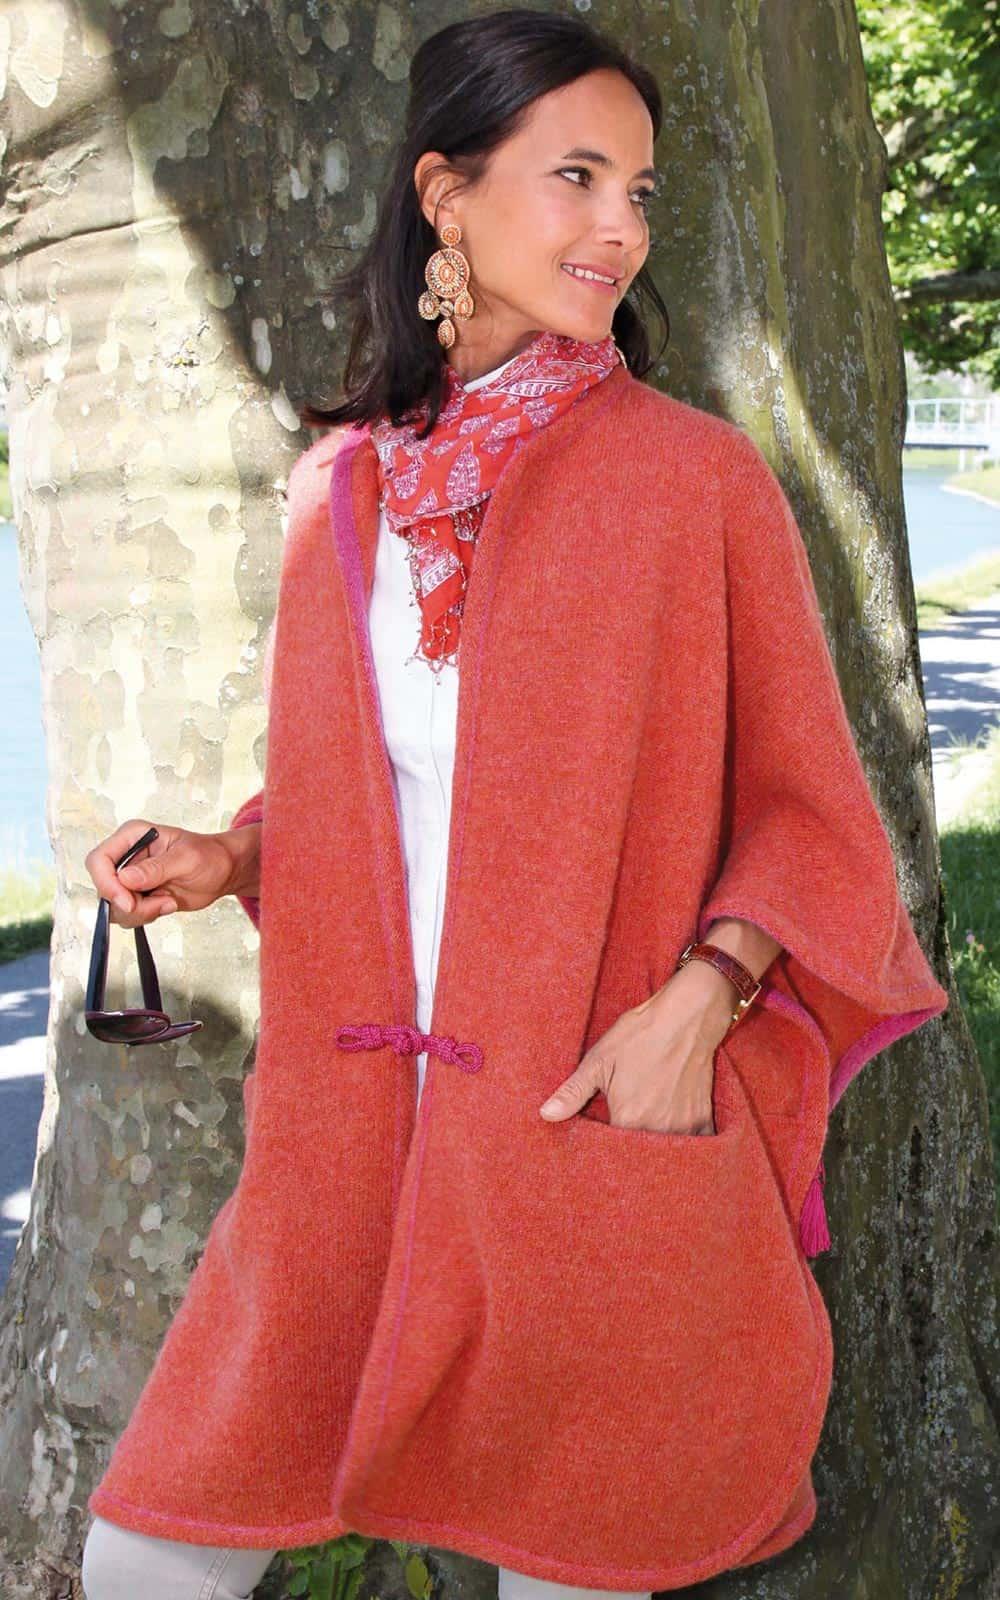 Overcoat: L393 Farbe: 4153/4153+290 (Steg57)